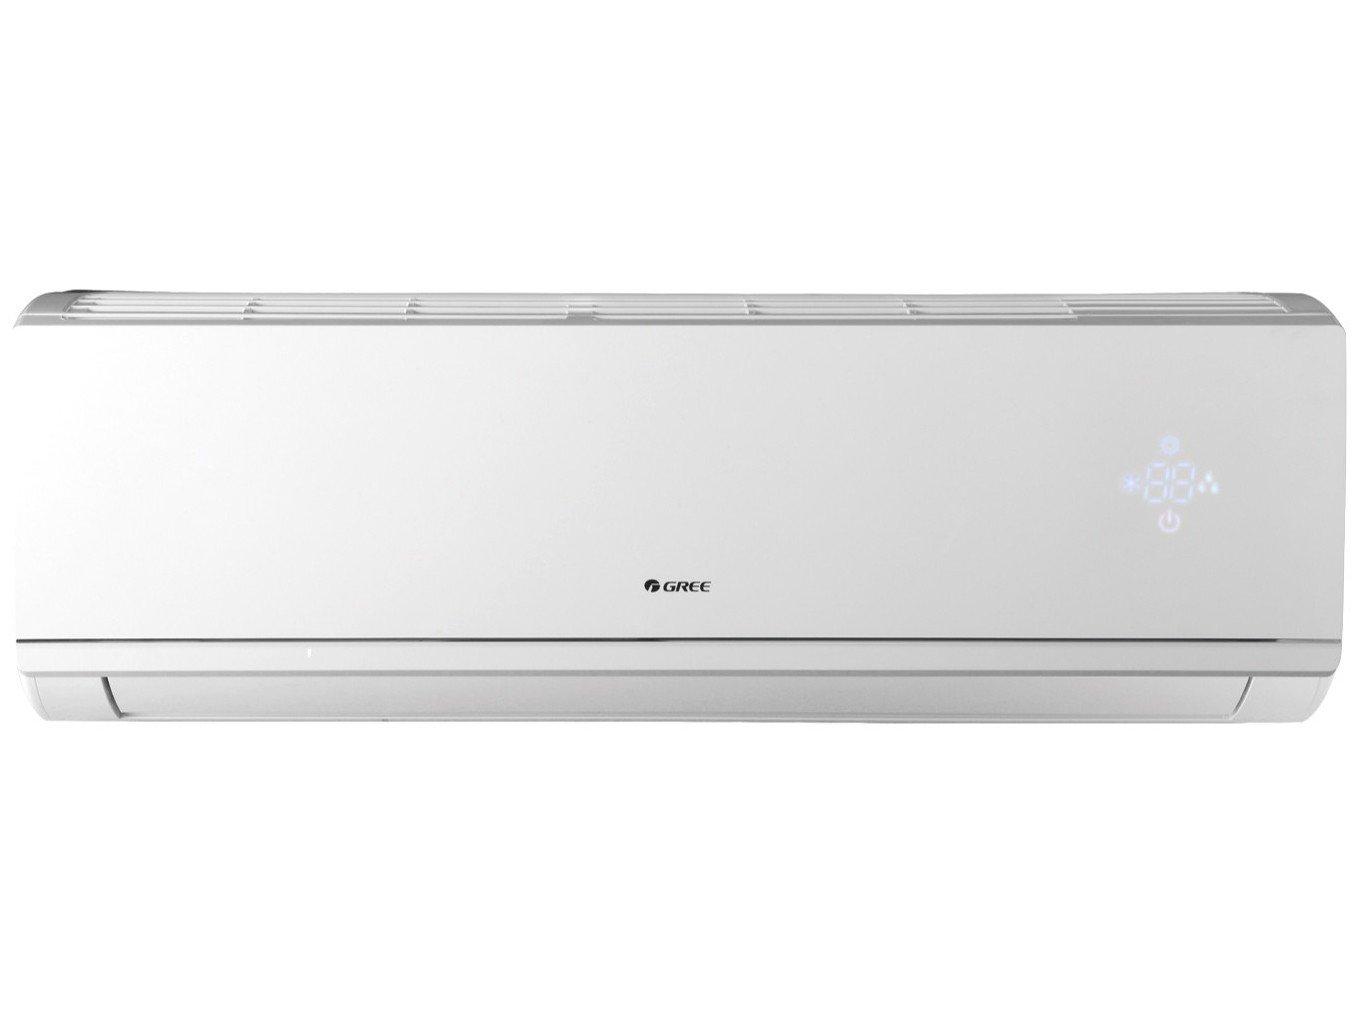 Ar-condicionado Split Gree Inverter 9.000 BTUs - Quente e Frio Hi-wall Eco Garden GWH09QAD3DNB8MI - 220 V - 3